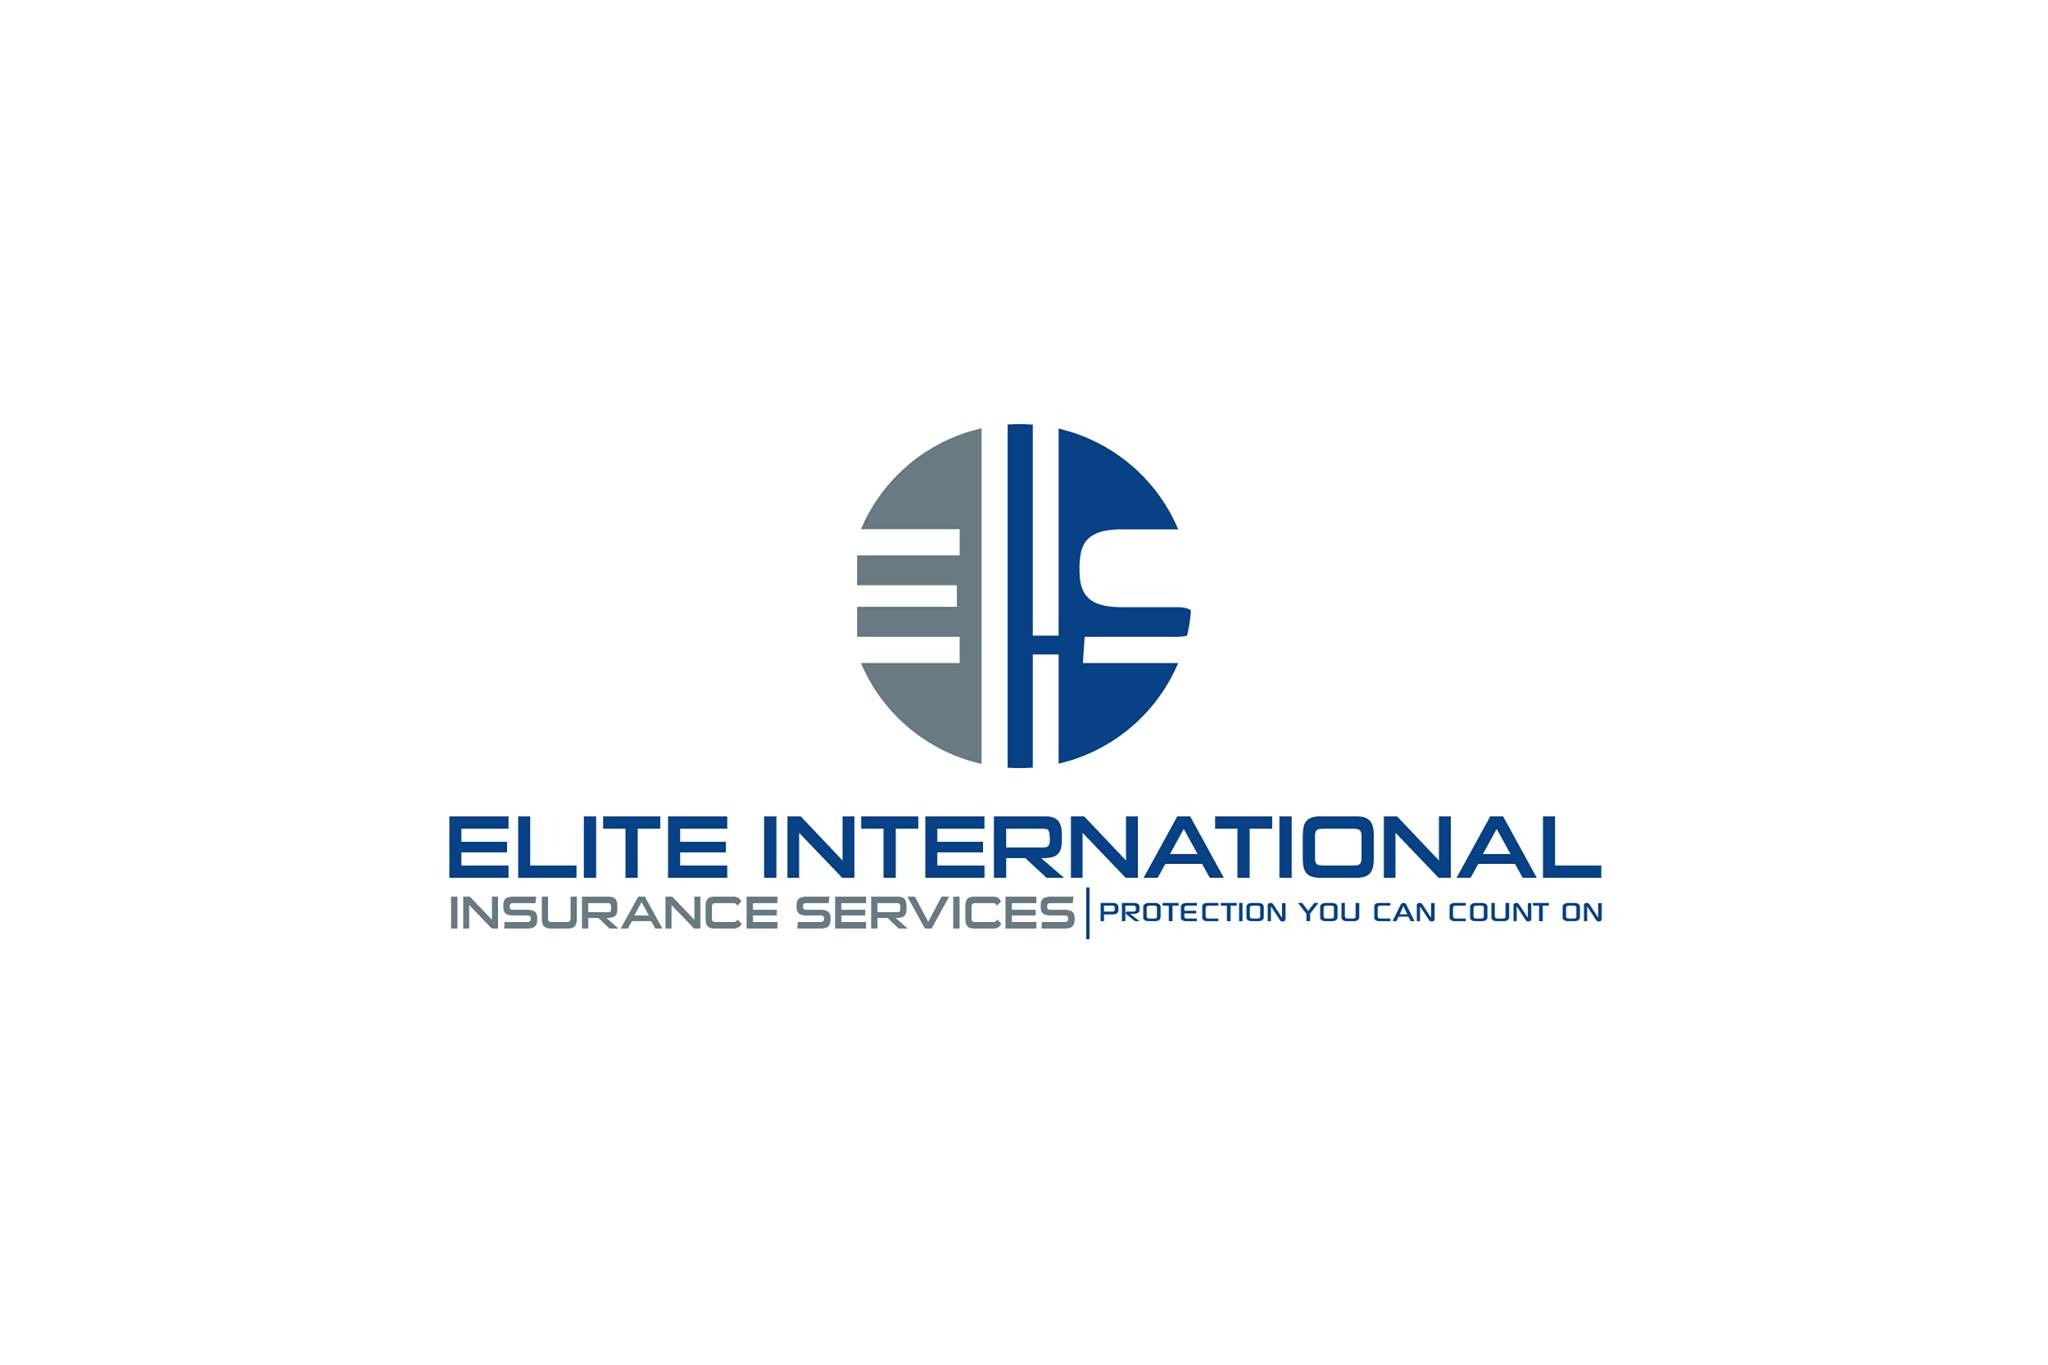 Elite International Insurance Services